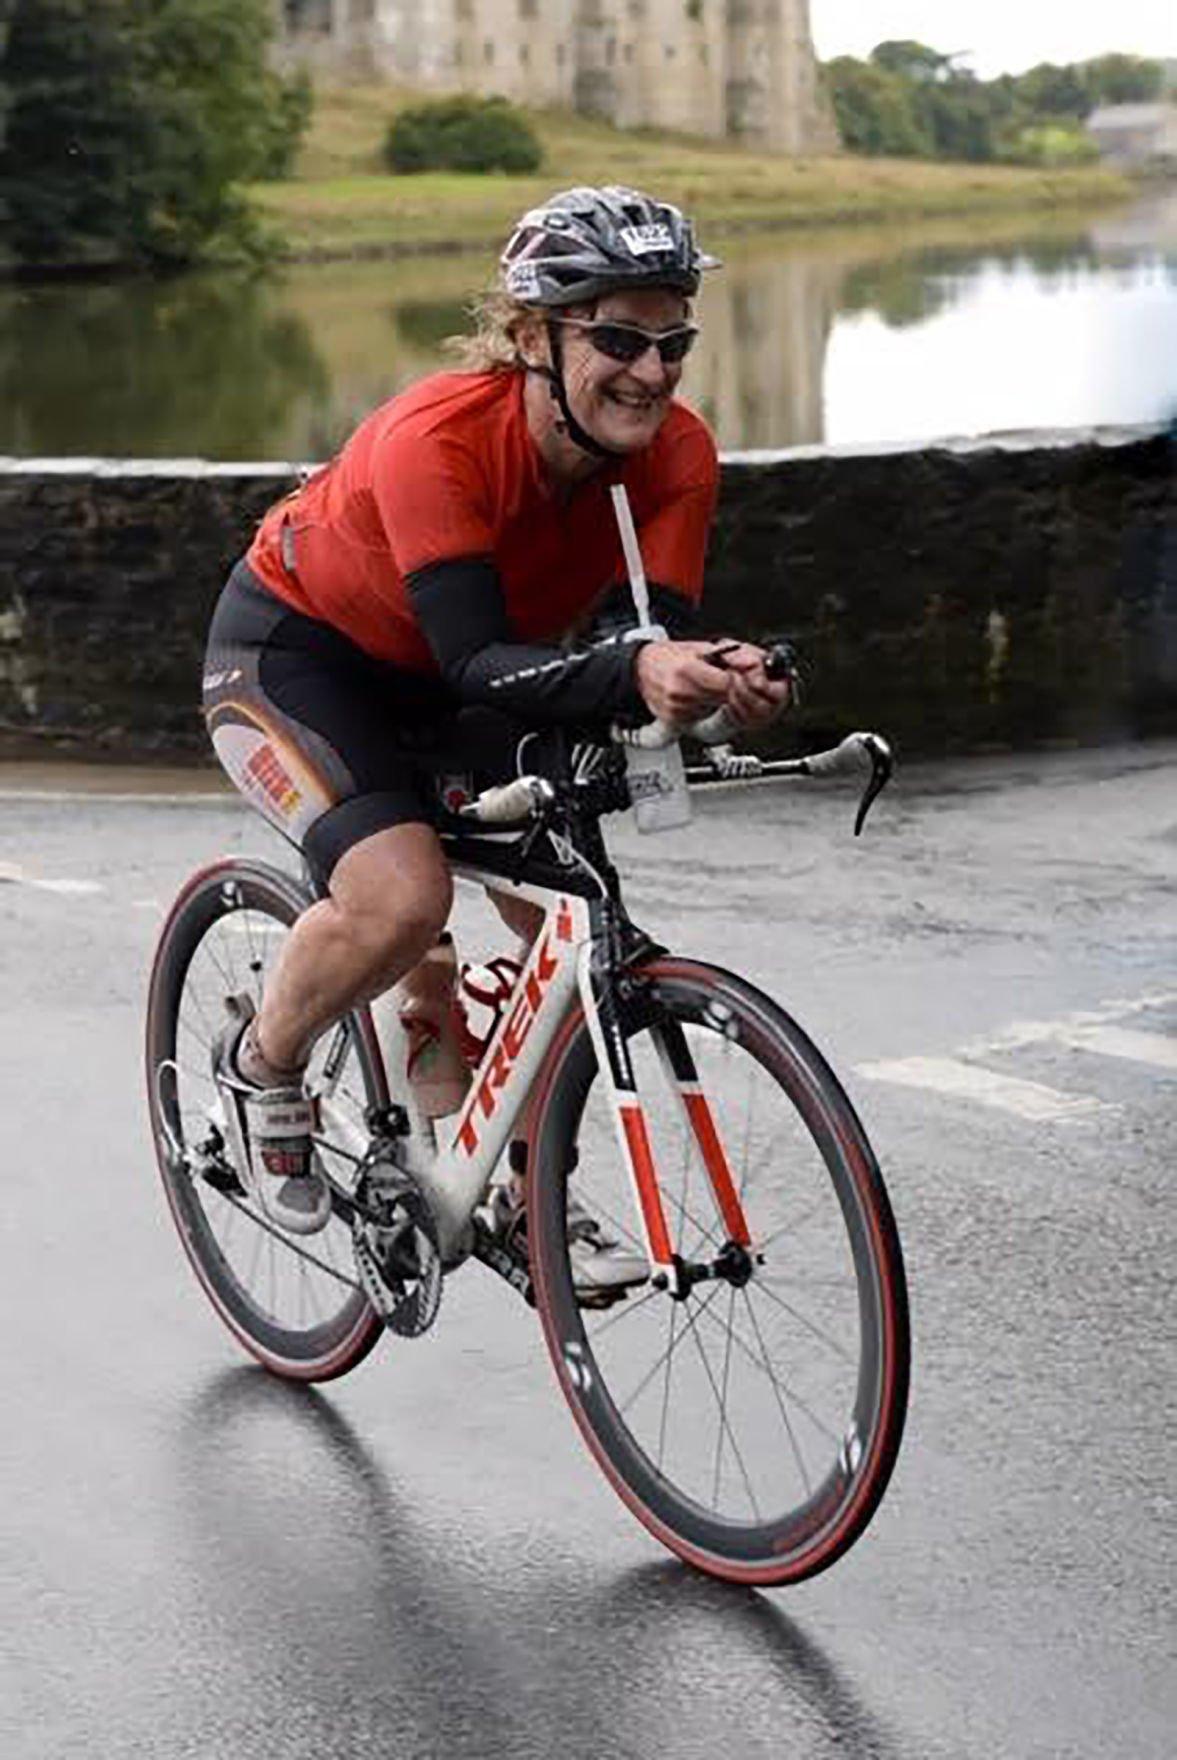 Rhiannon biking